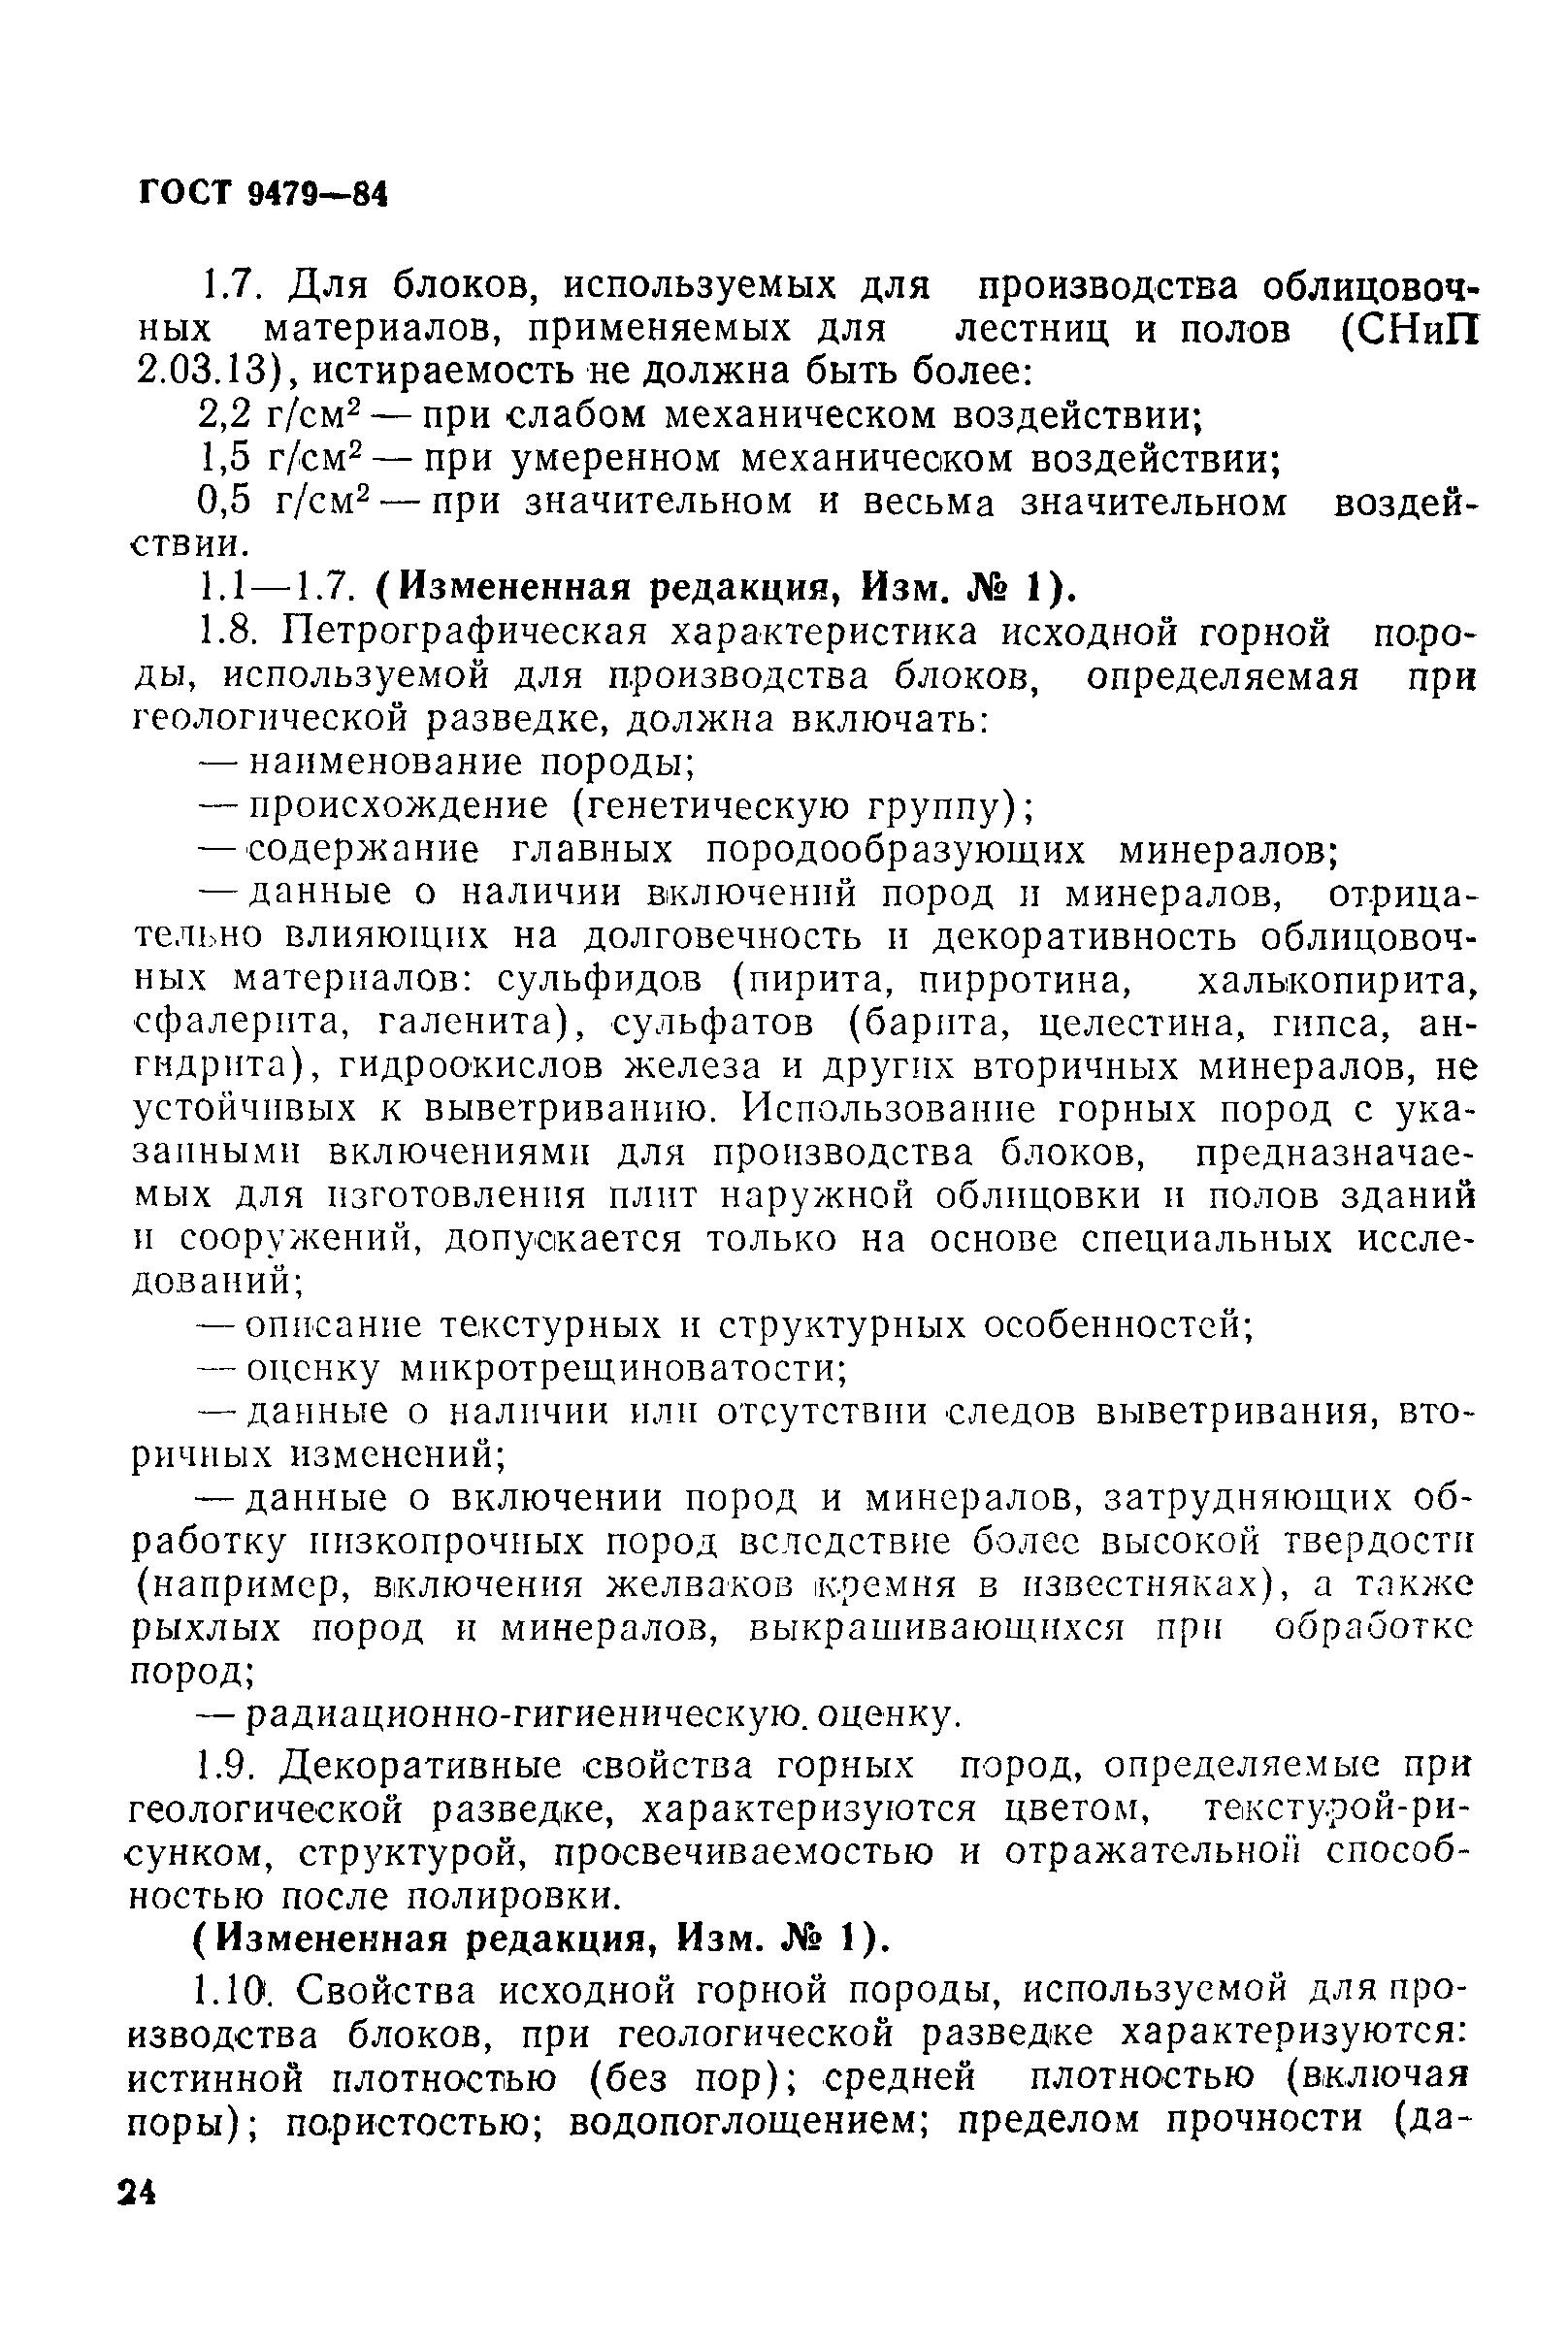 Гост 9479-84